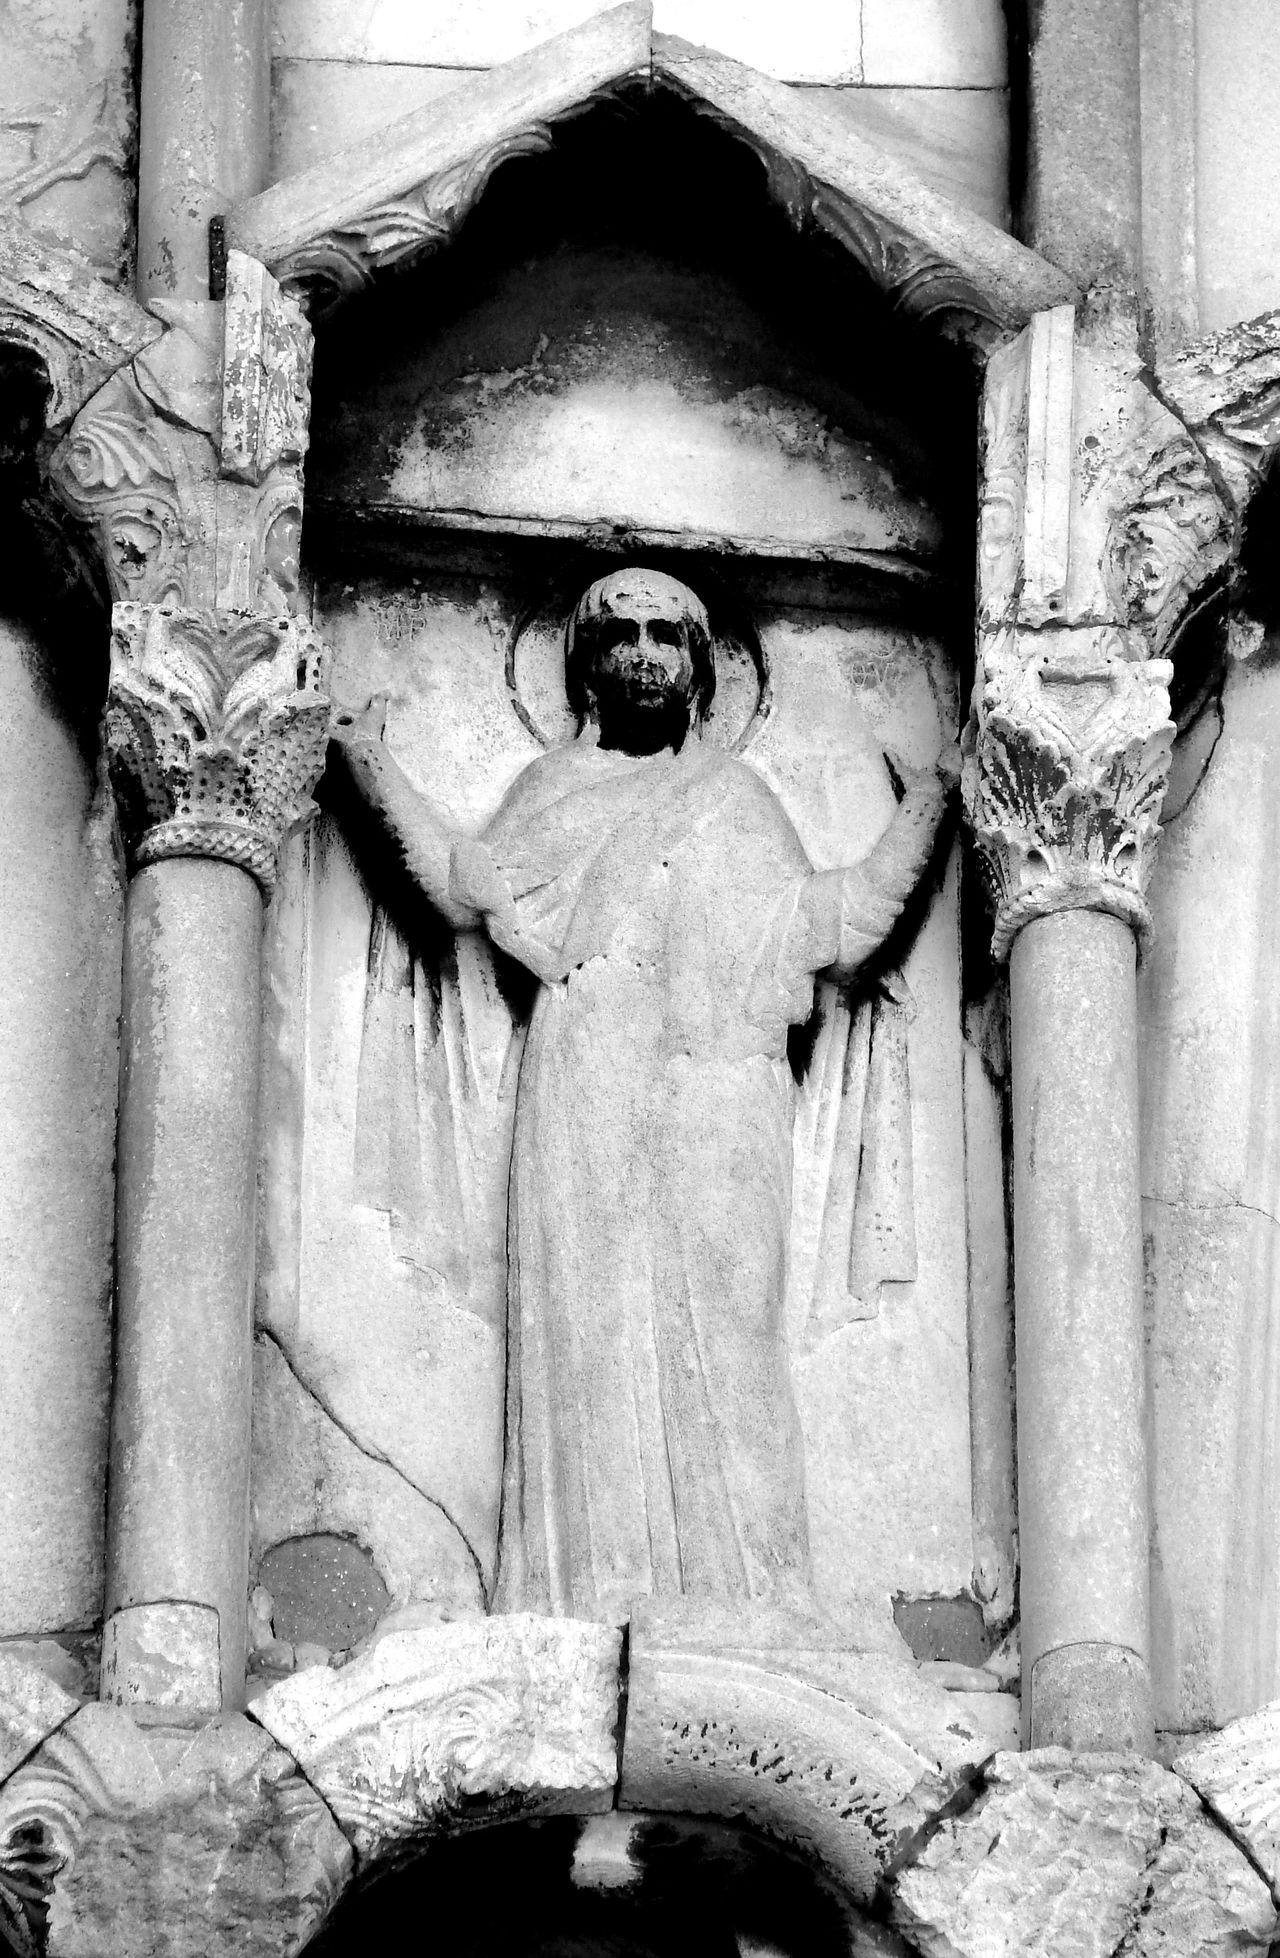 Facade details, Church Santa Maria Della Piazza, Ancona, Italy Ancona Architecture Art Byzantine Church Facedepet Faith Italy Le Marché Marbre Medieval Medieval Art Middle Age Romanesque Romanesque Sculpture Sculpture Virgin Praying